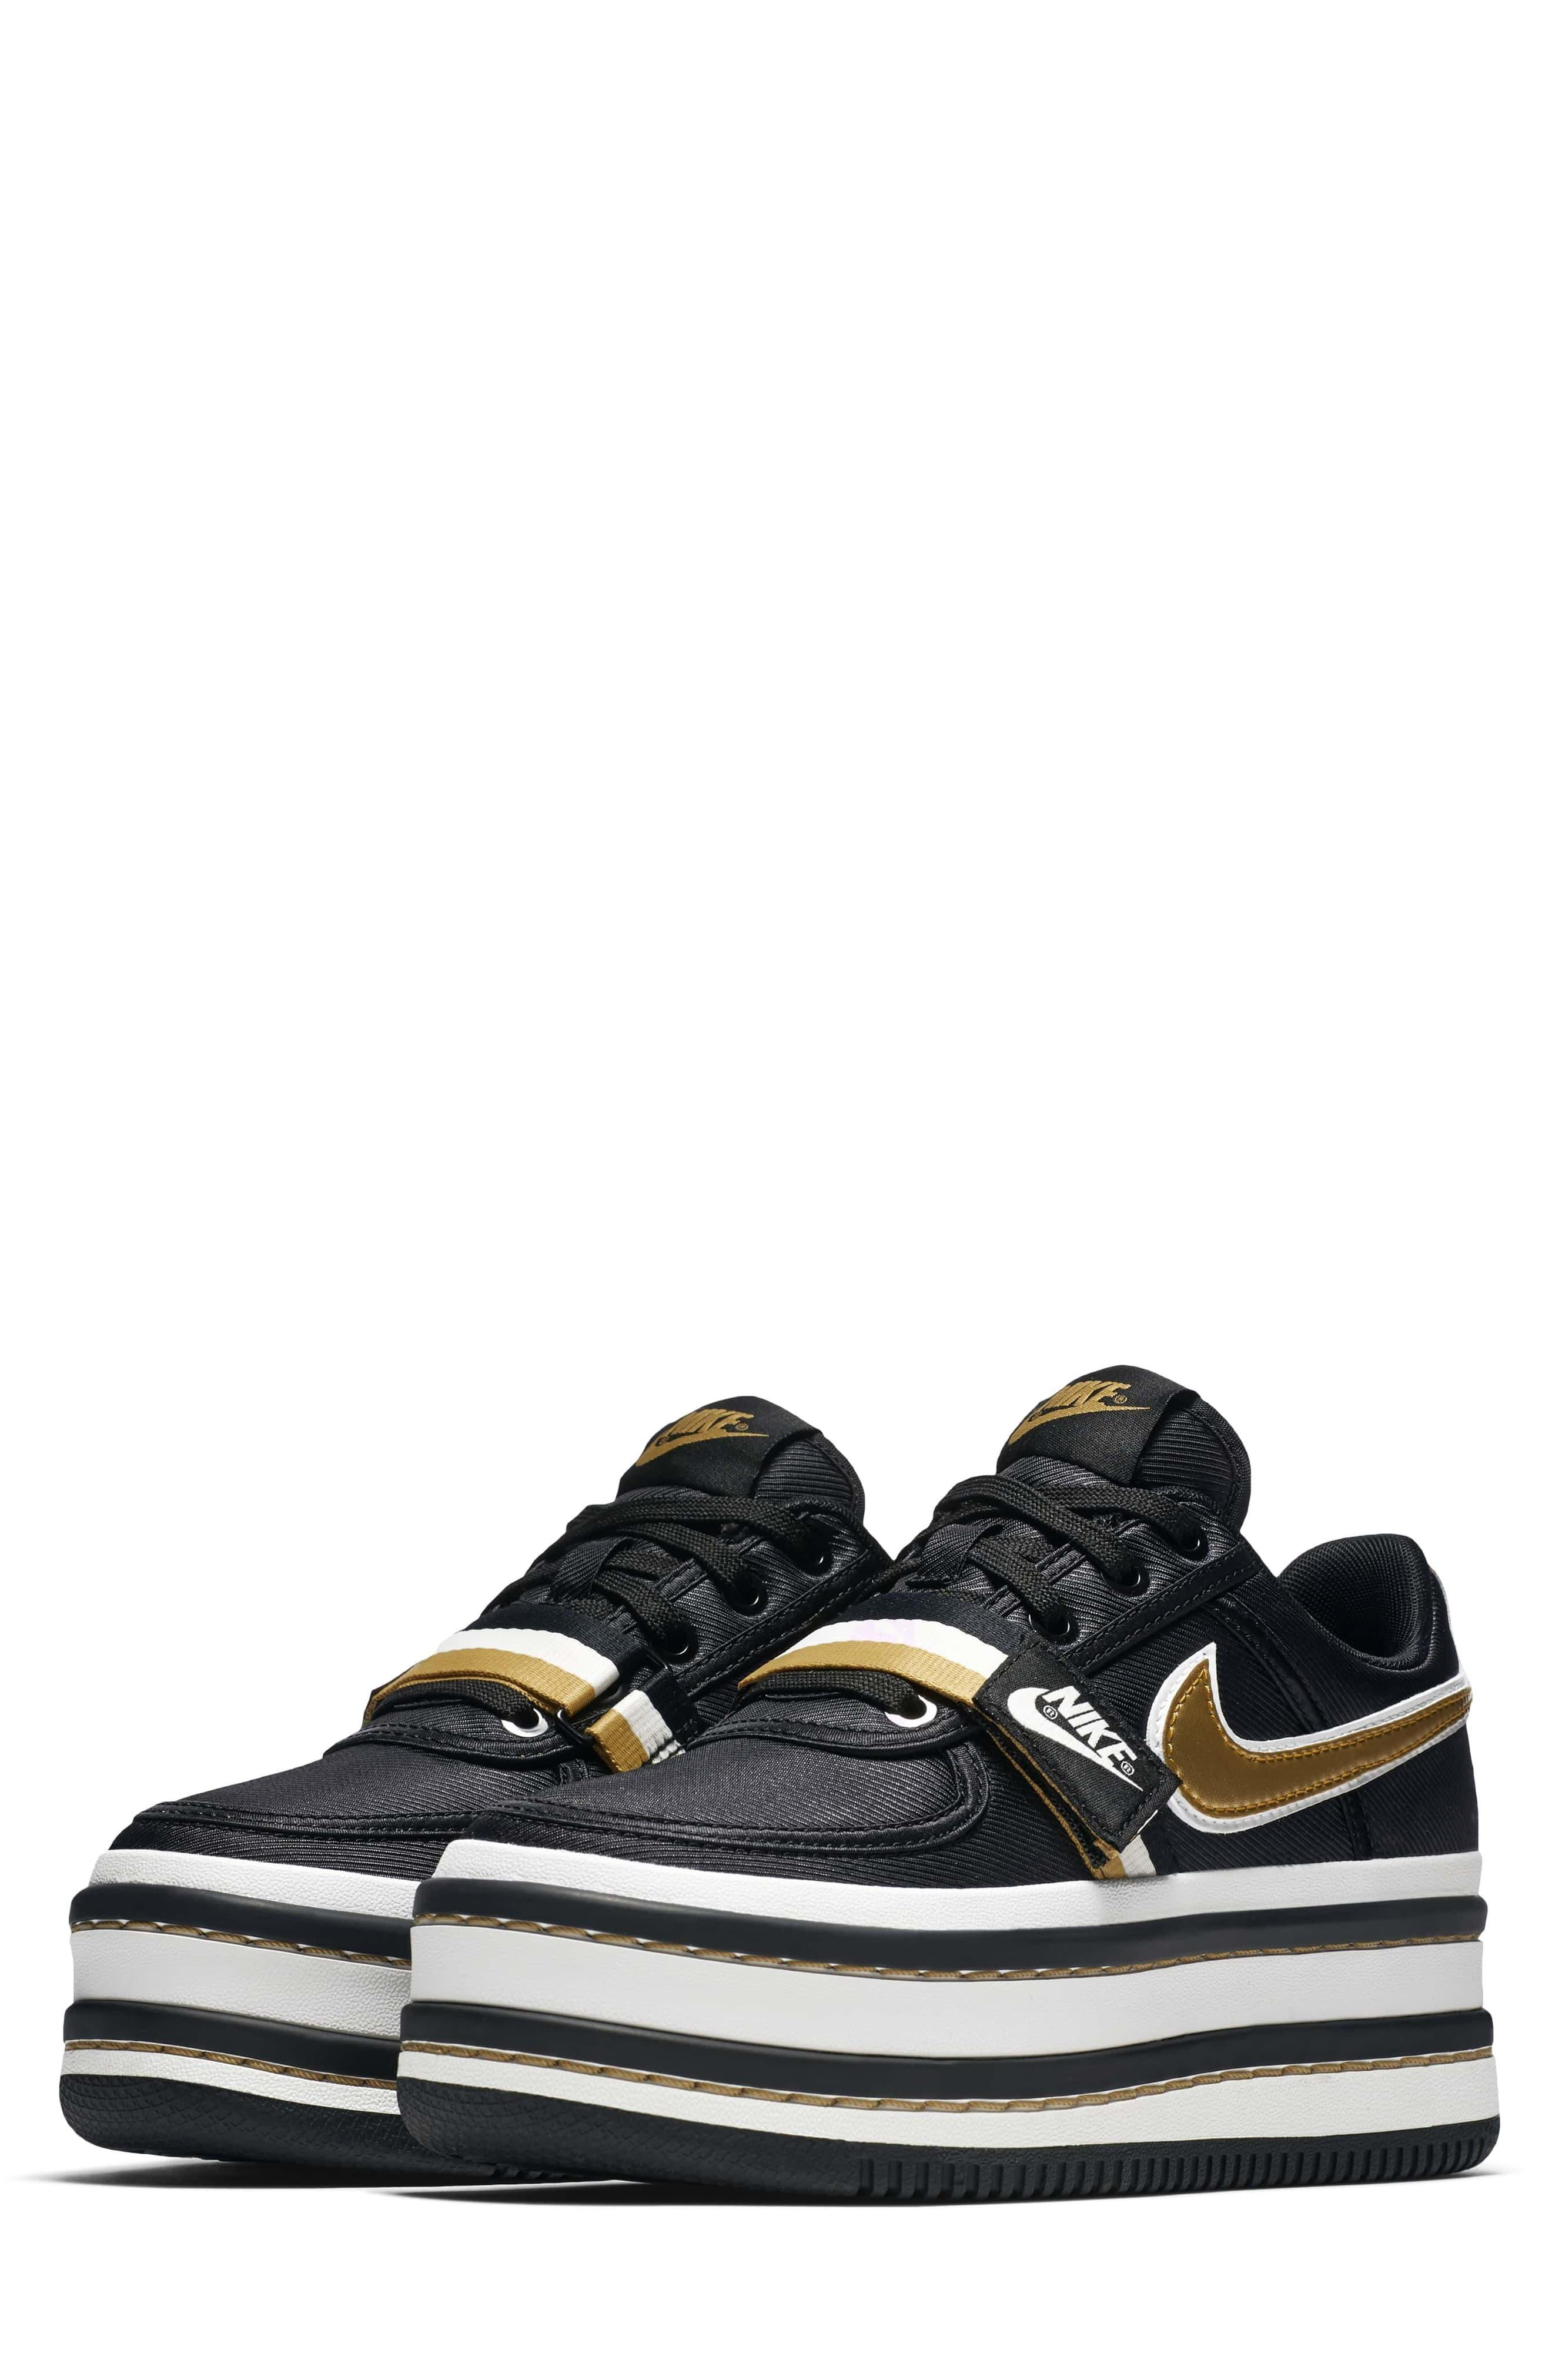 cheap for discount 3b03c 55bfc Women s Black Vandal 2k Sneaker